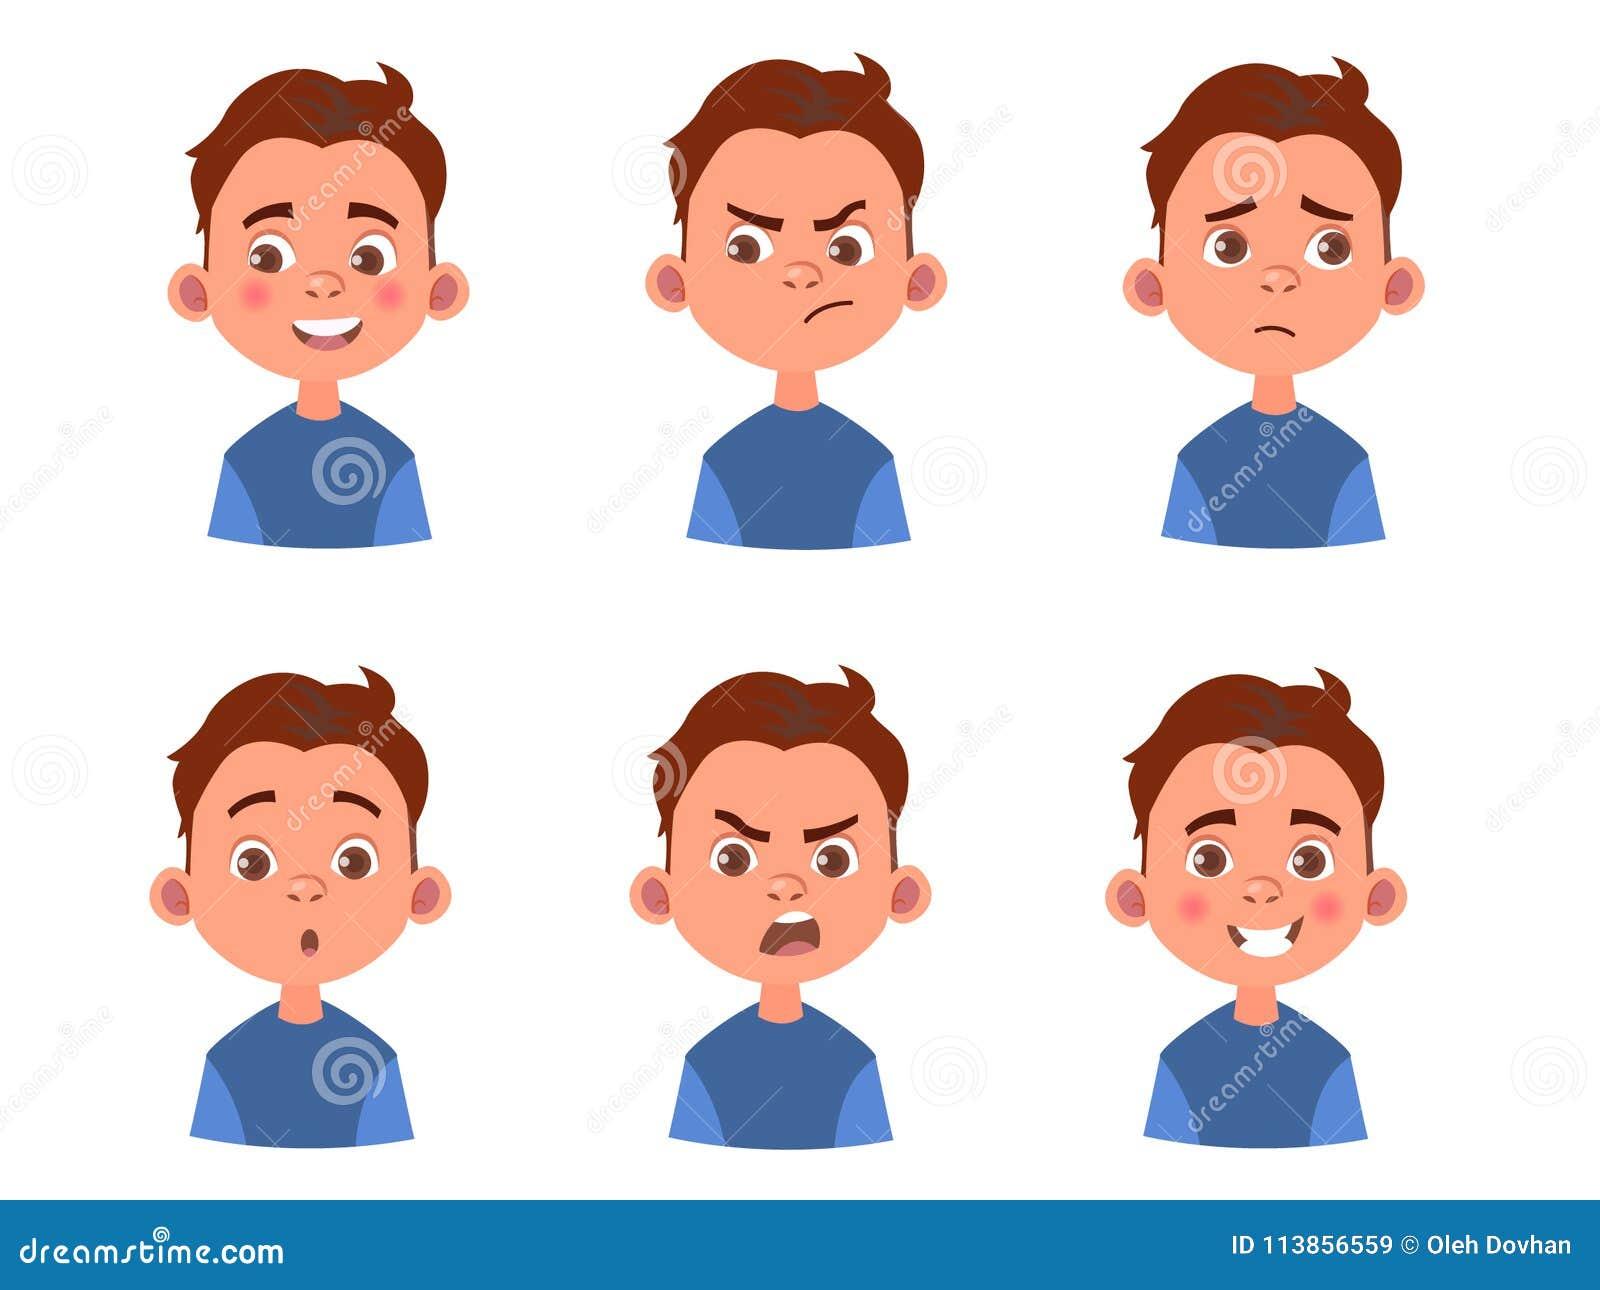 Set Of Cartoon Childrens Faces Stock Vector Art More: Set Of Kid`s Emotions. Facial Expression. Cartoon Boy